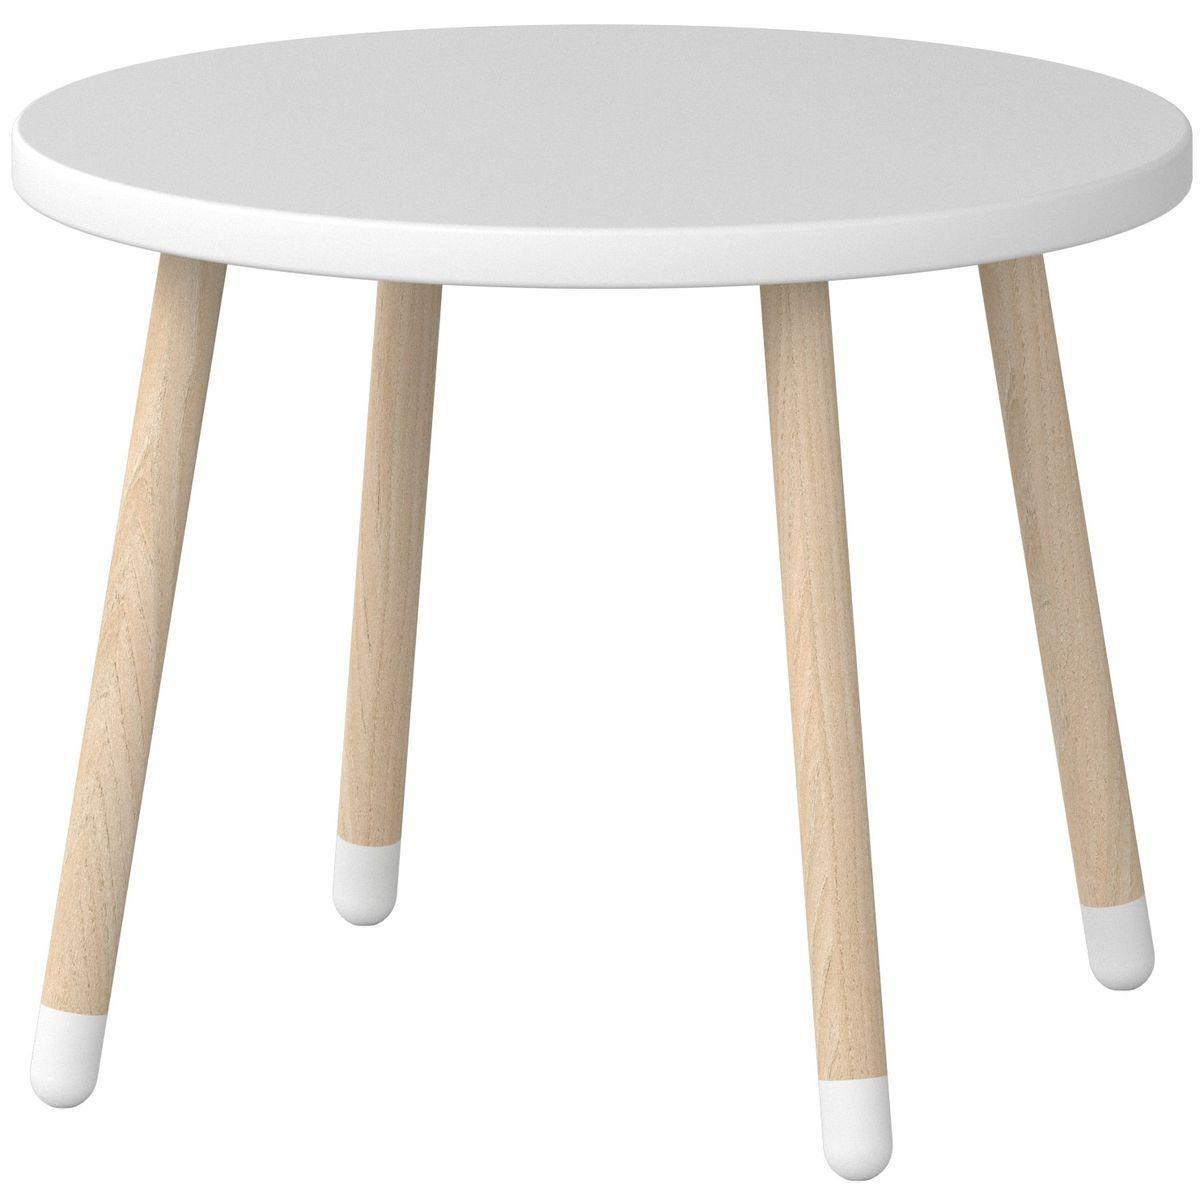 DOTS by Flexa Petite table enfant 60 cm Blanche